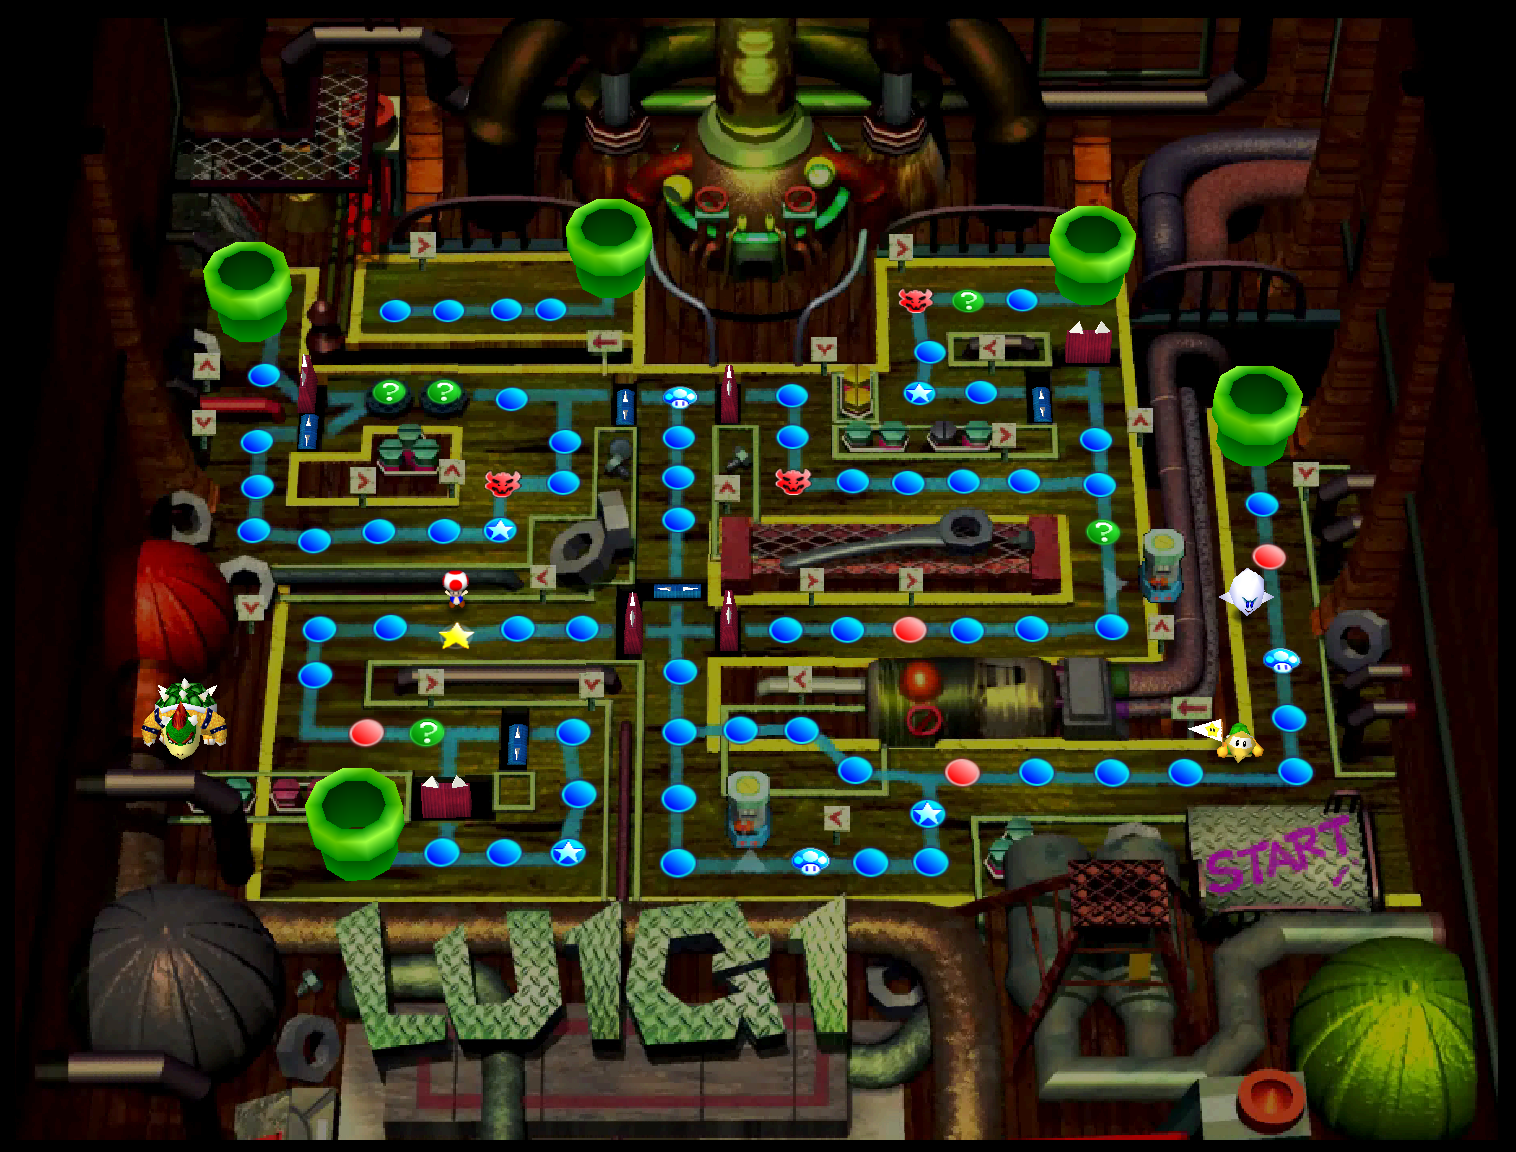 Luigi 39 s engine room mariowiki fandom powered by wikia - Luigi mario party ...